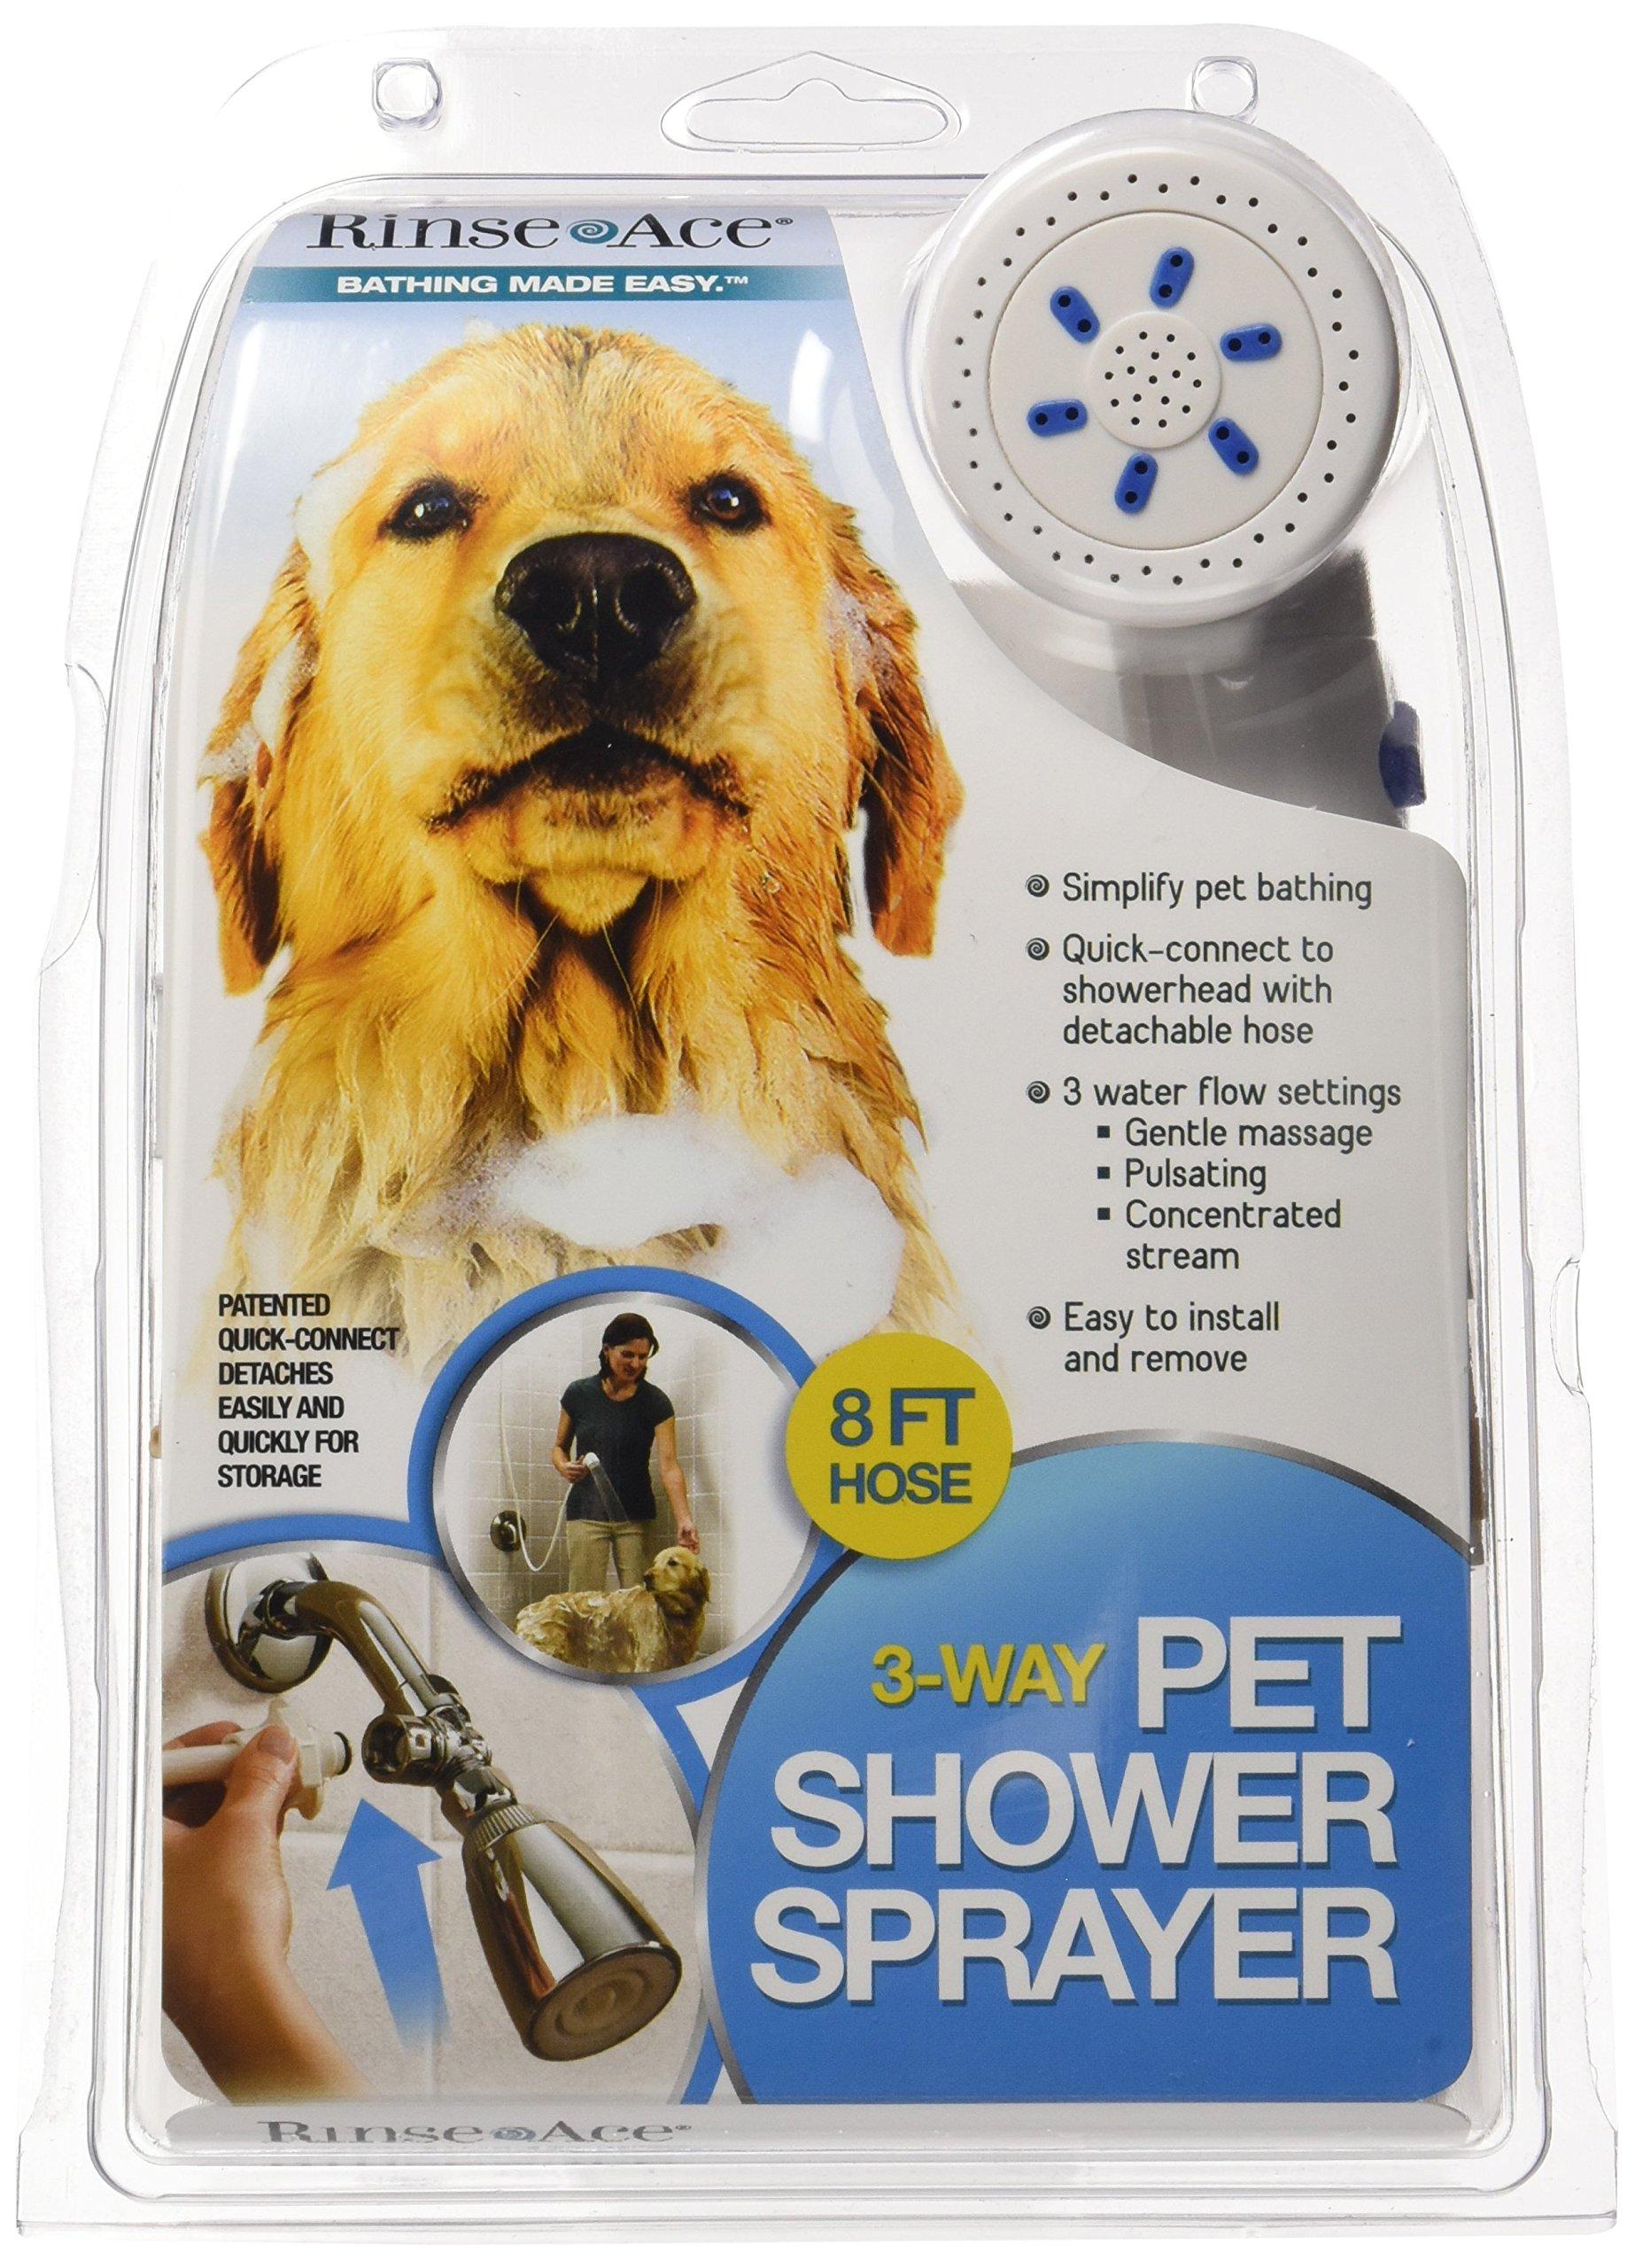 Rinse Ace Sprayer Connect Showerhead